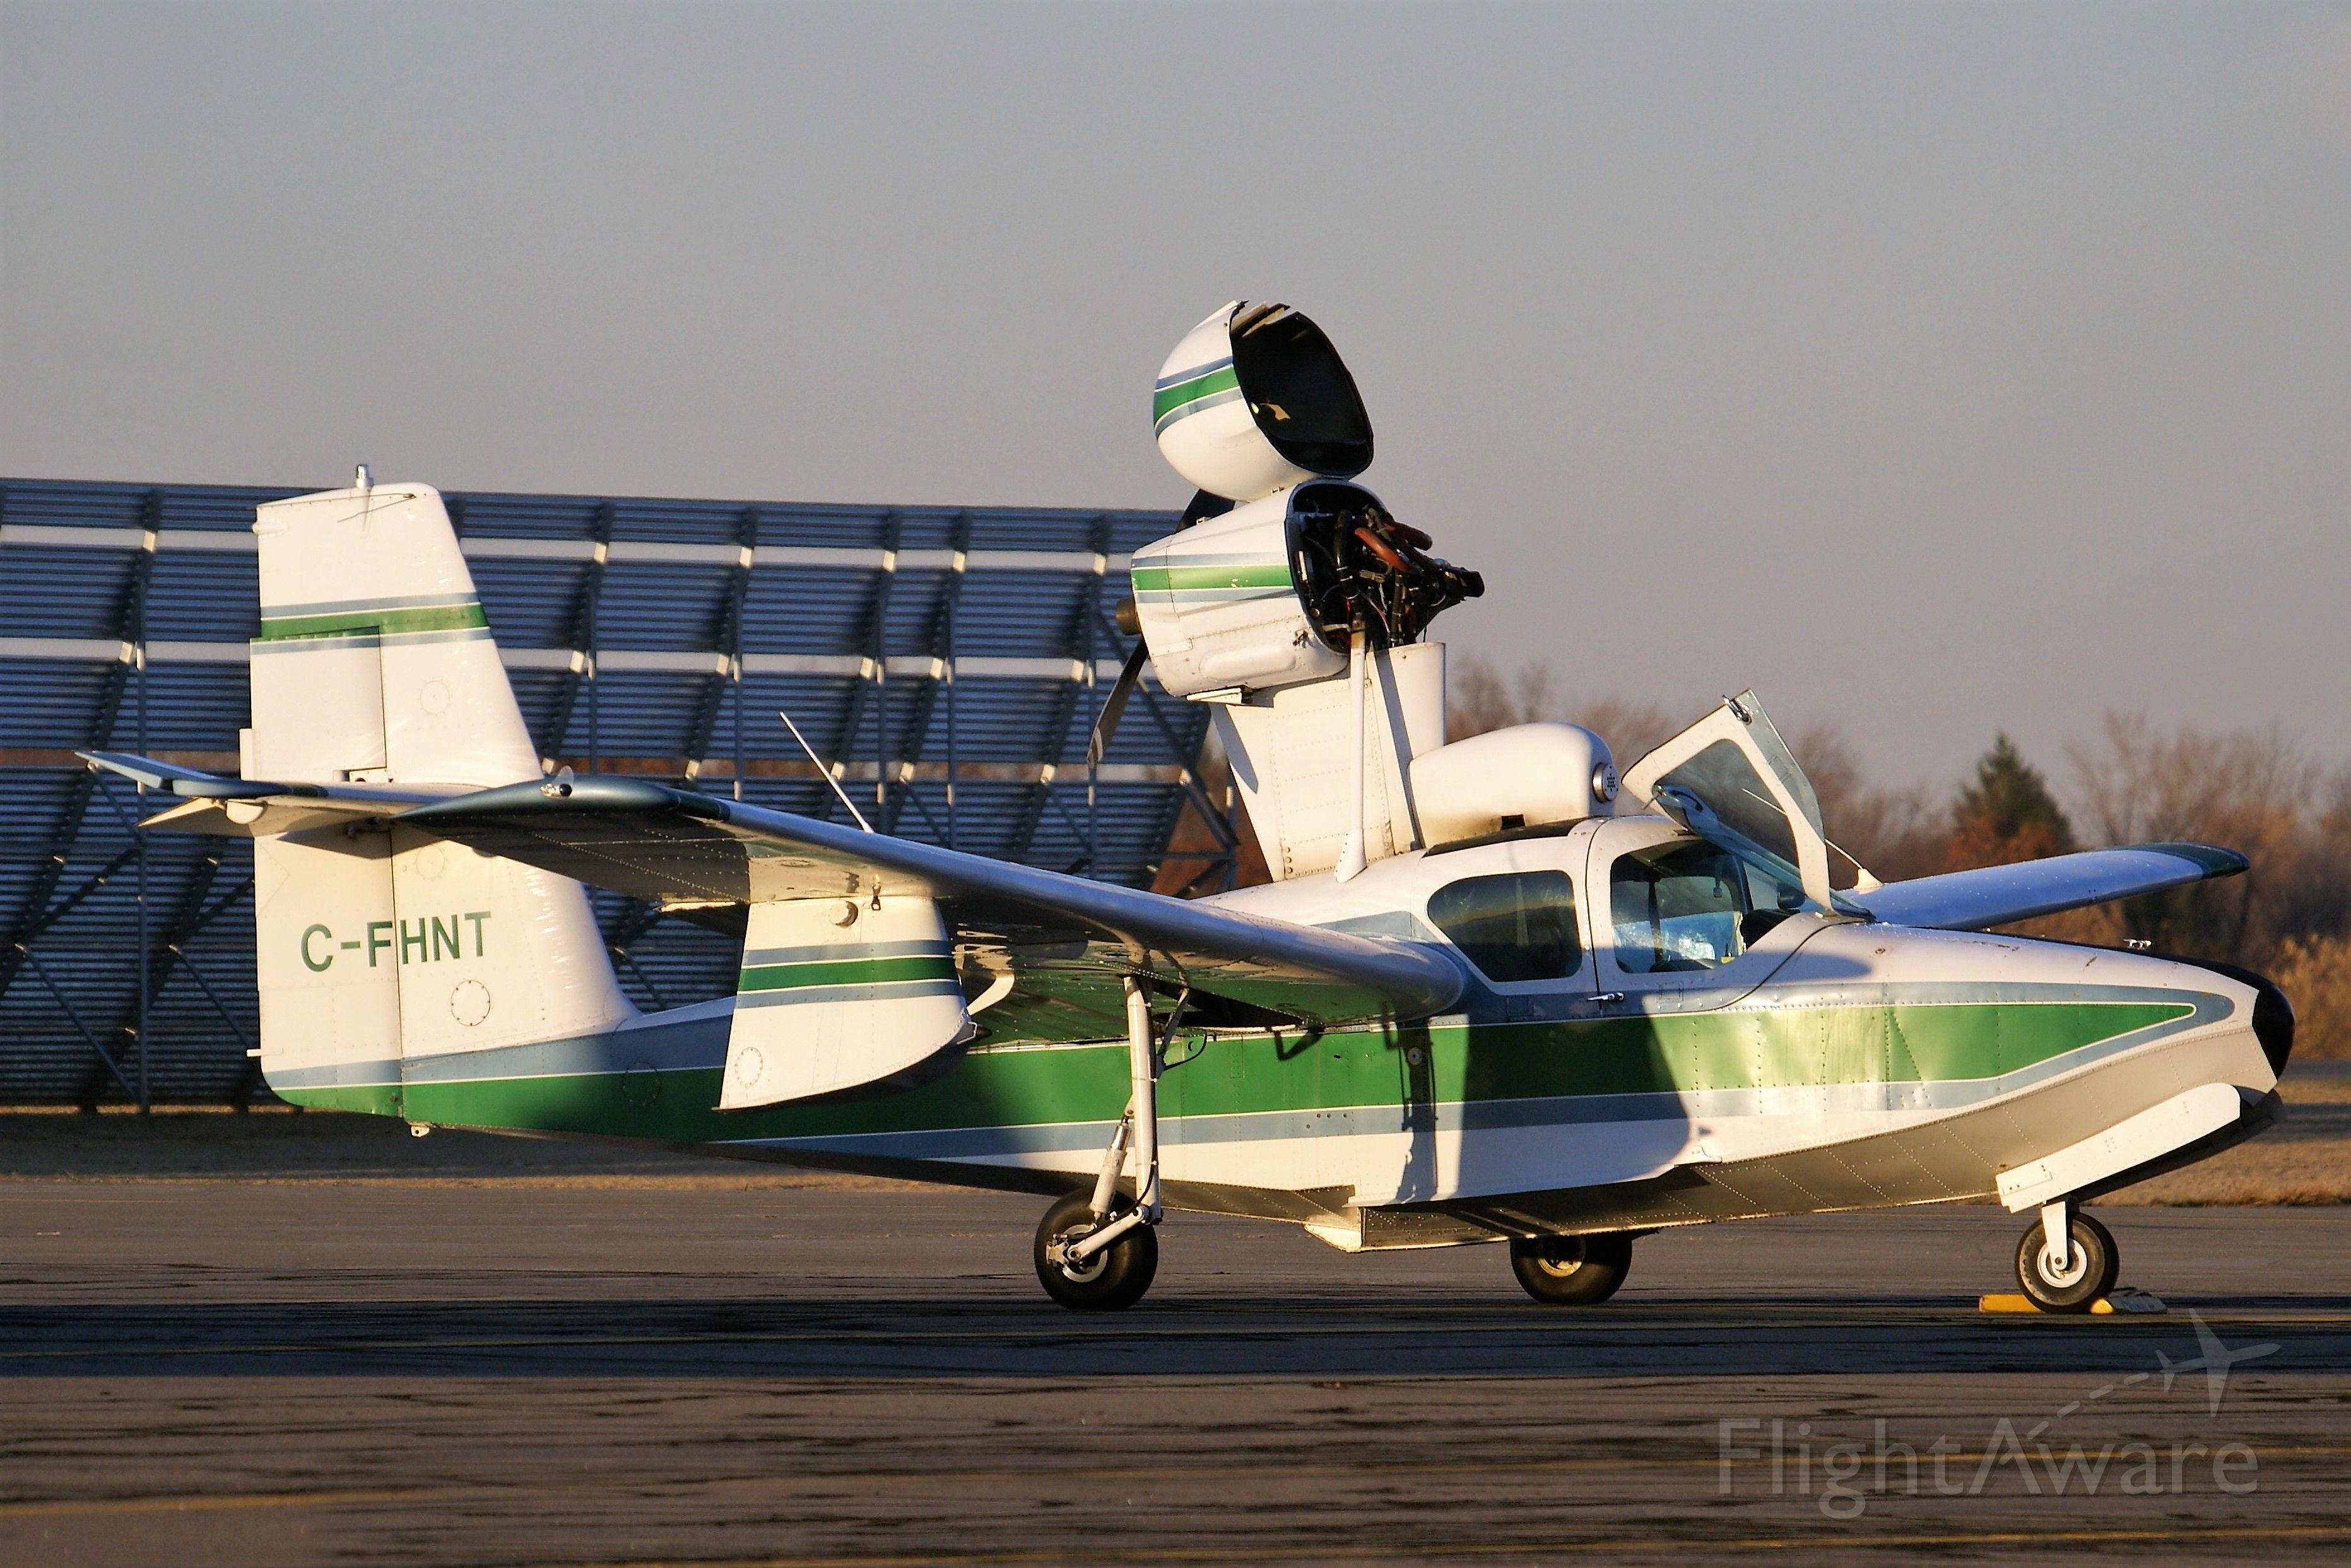 LAKE LA-200 (C-FHNT) - Having a small maintenance issue.